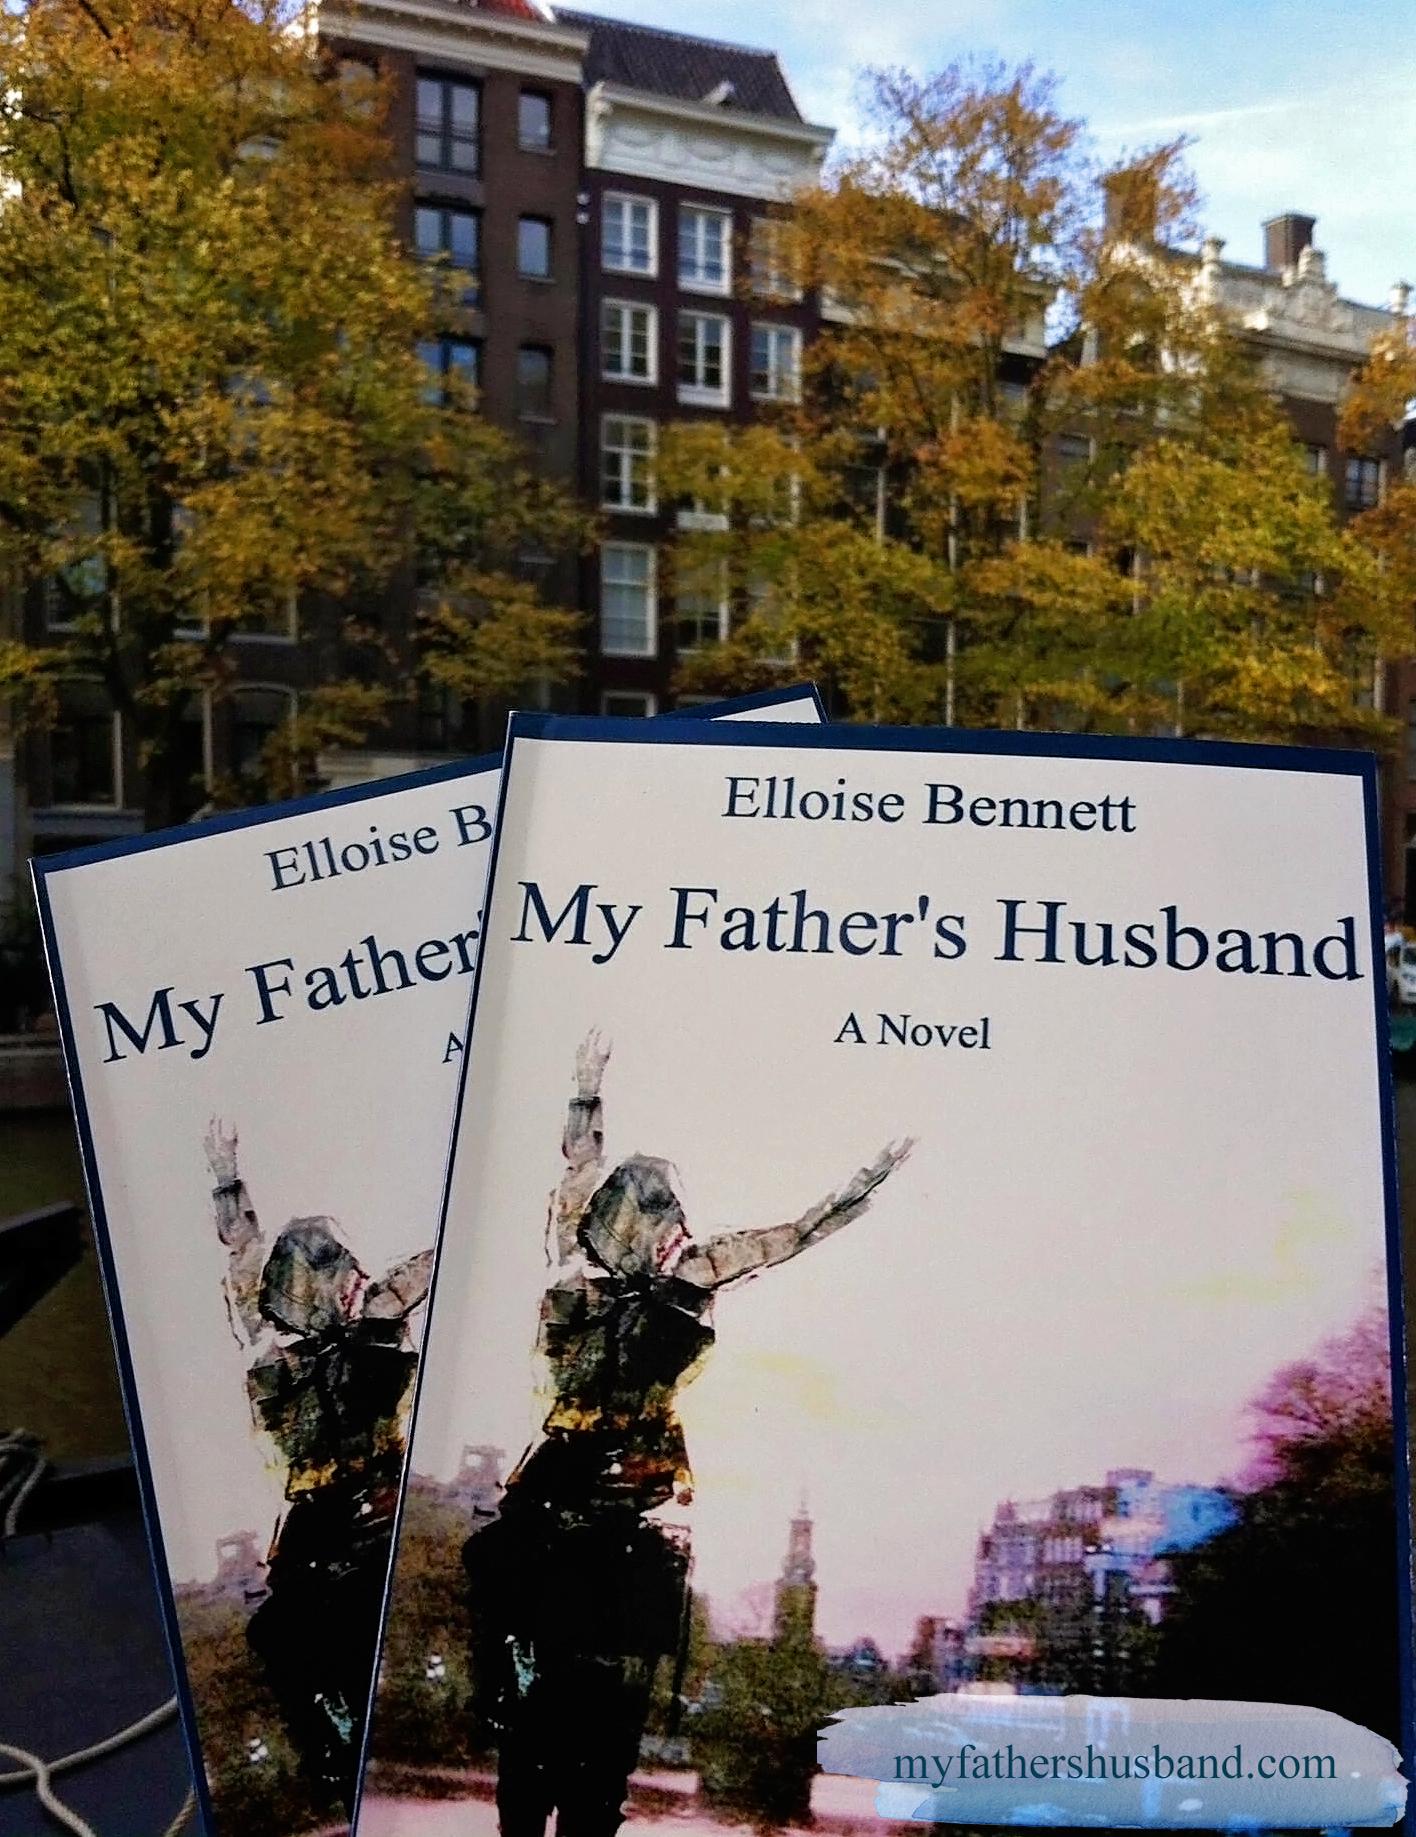 My Father's Husband: A Novel by Elloise Bennett myfathershusband.com